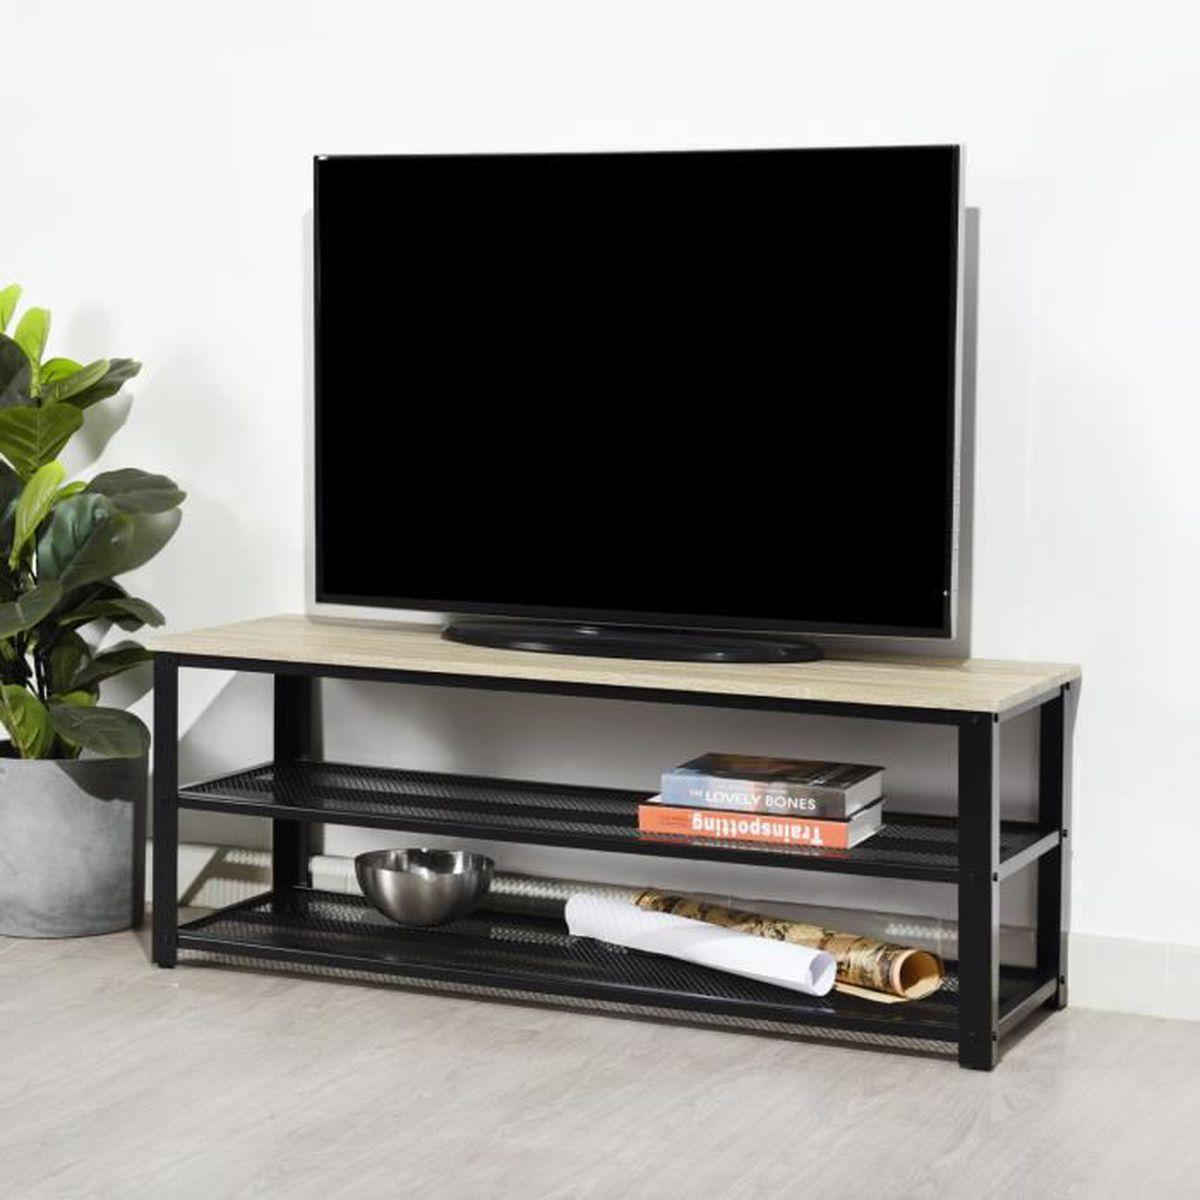 Meuble Tv Angle Suspendu meuble tv noir